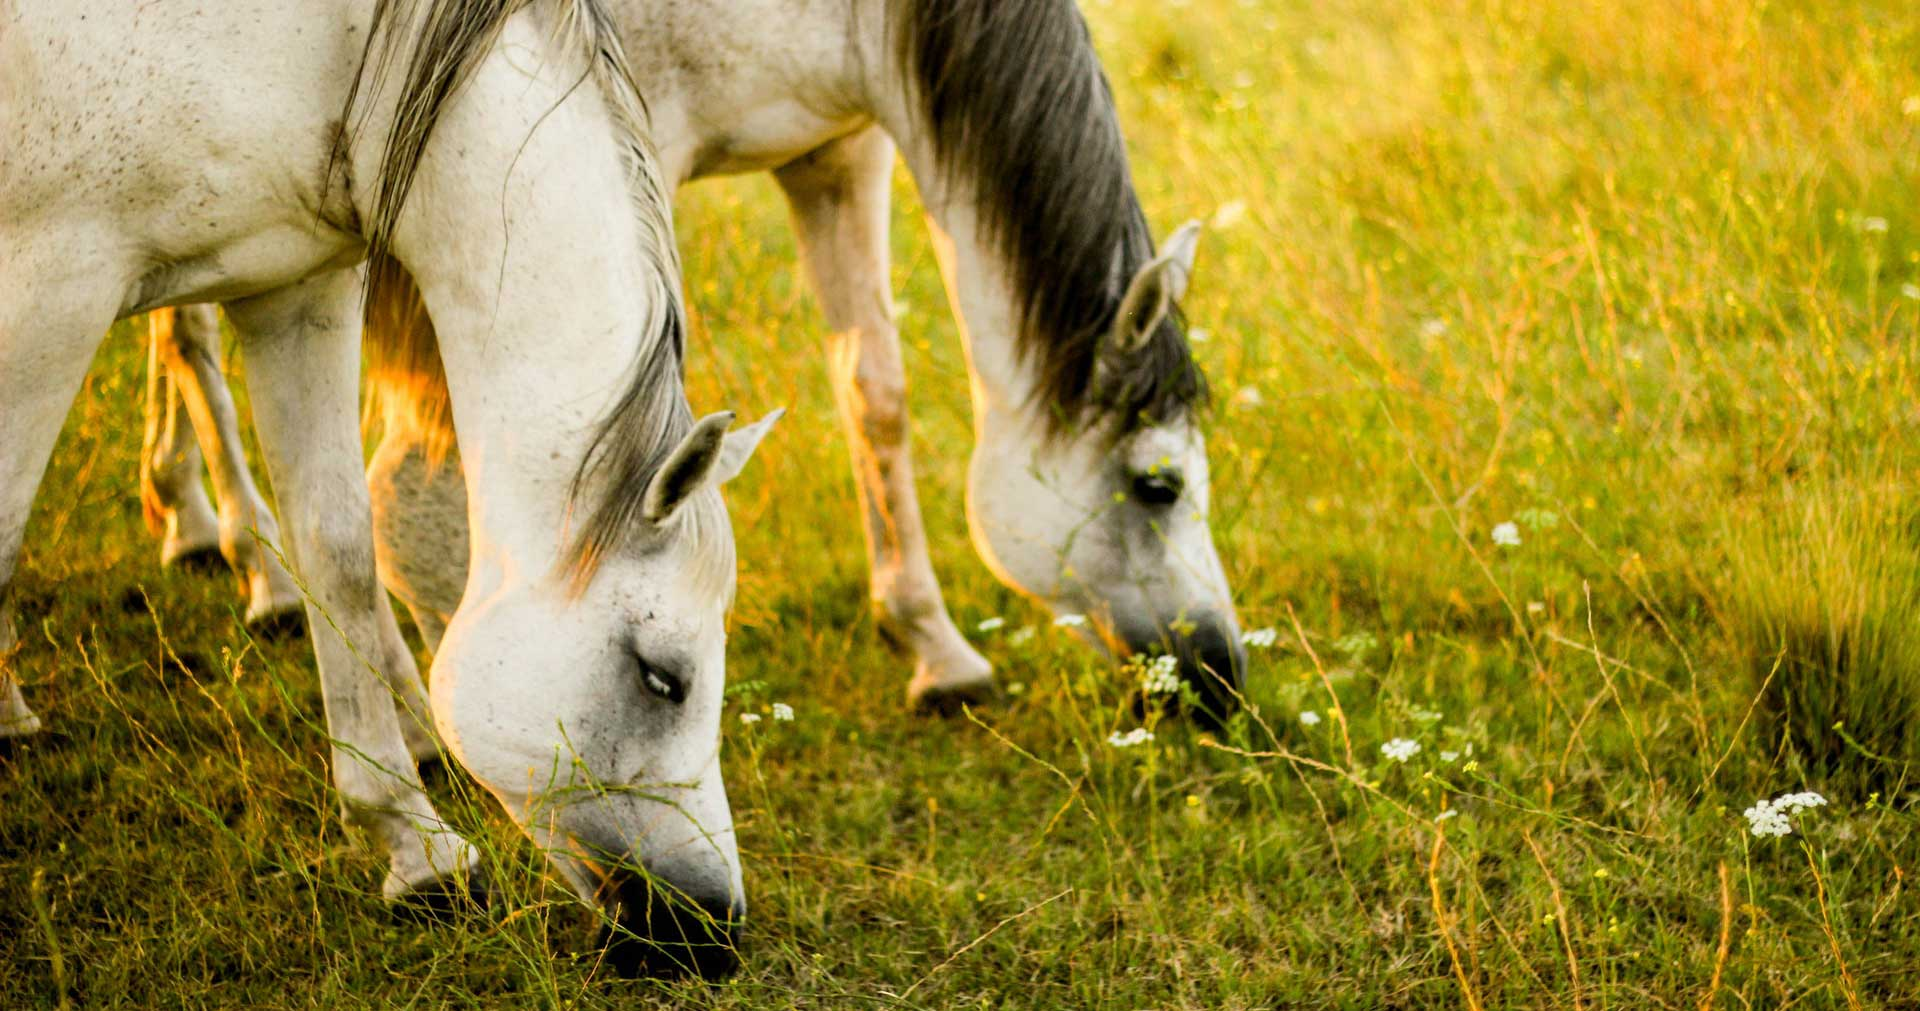 Two beautiful horses grazing